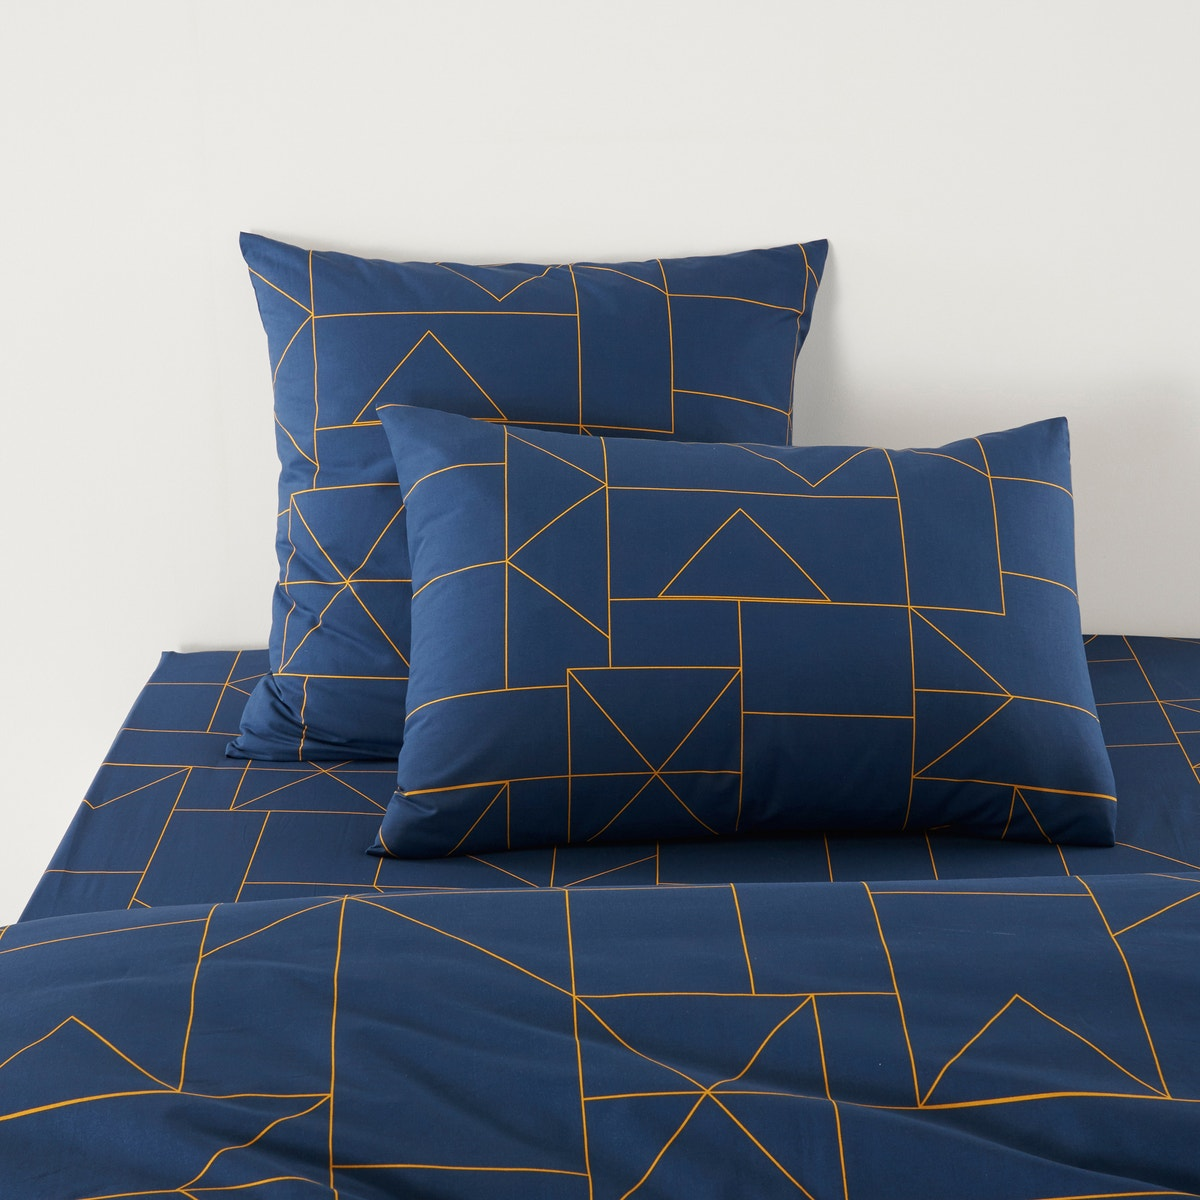 Dwight コットン 幾何学模様プリント枕カバー